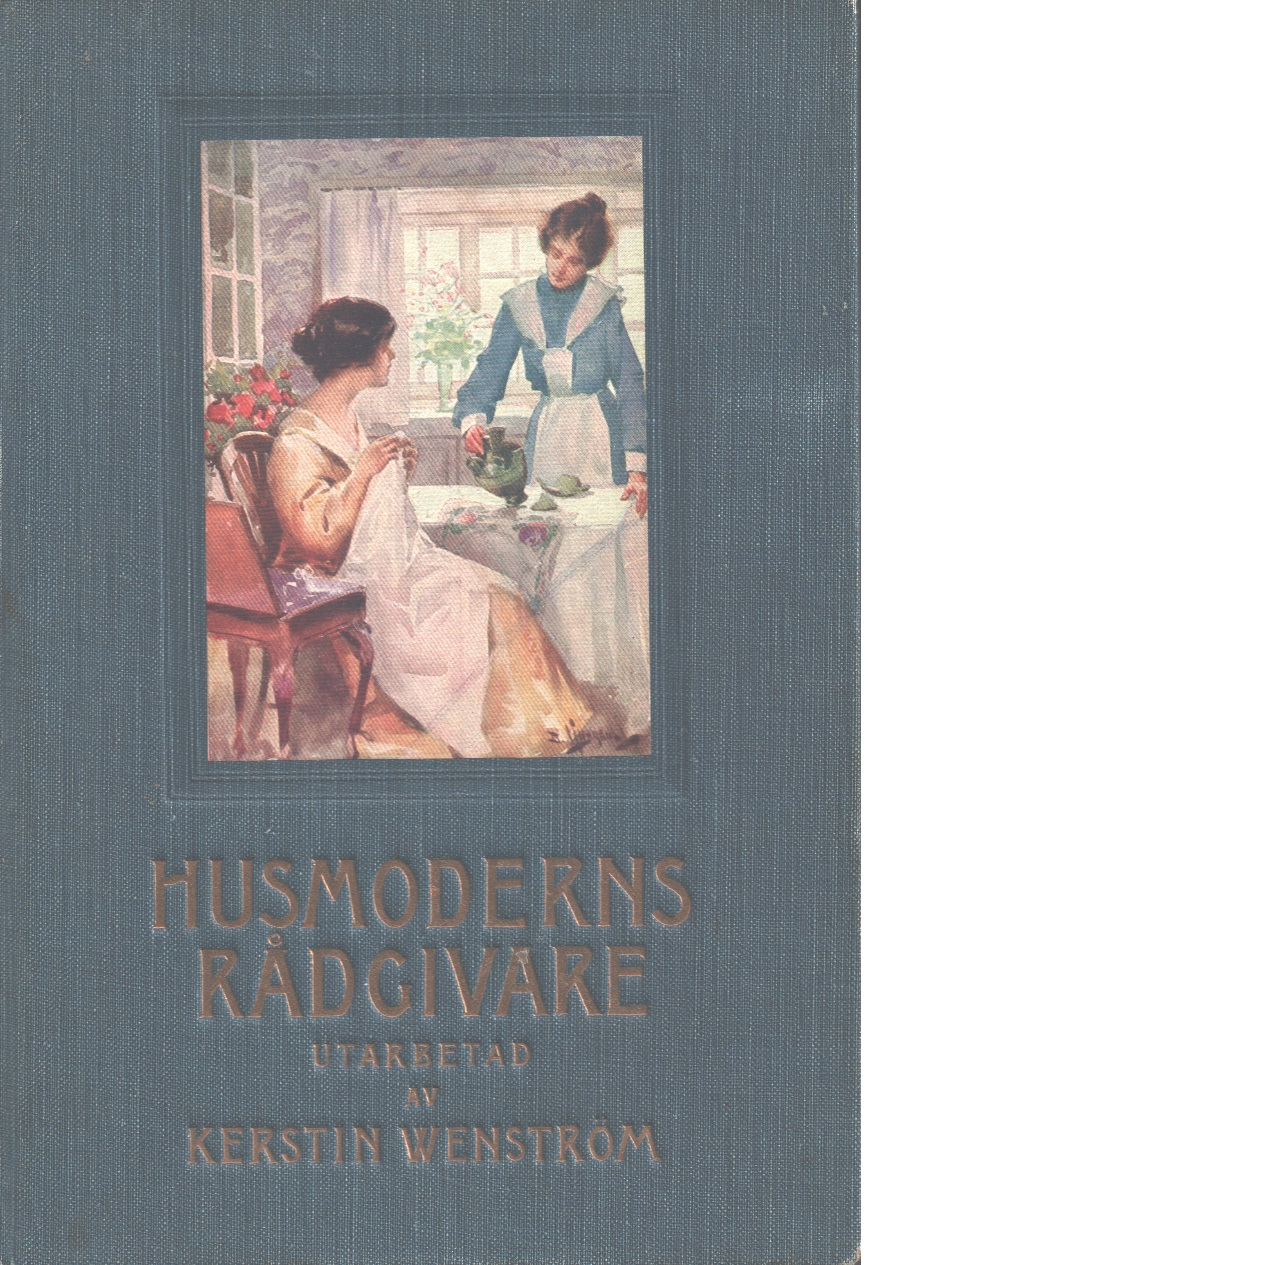 Husmoderns rådgivare - Wenström, Kerstin